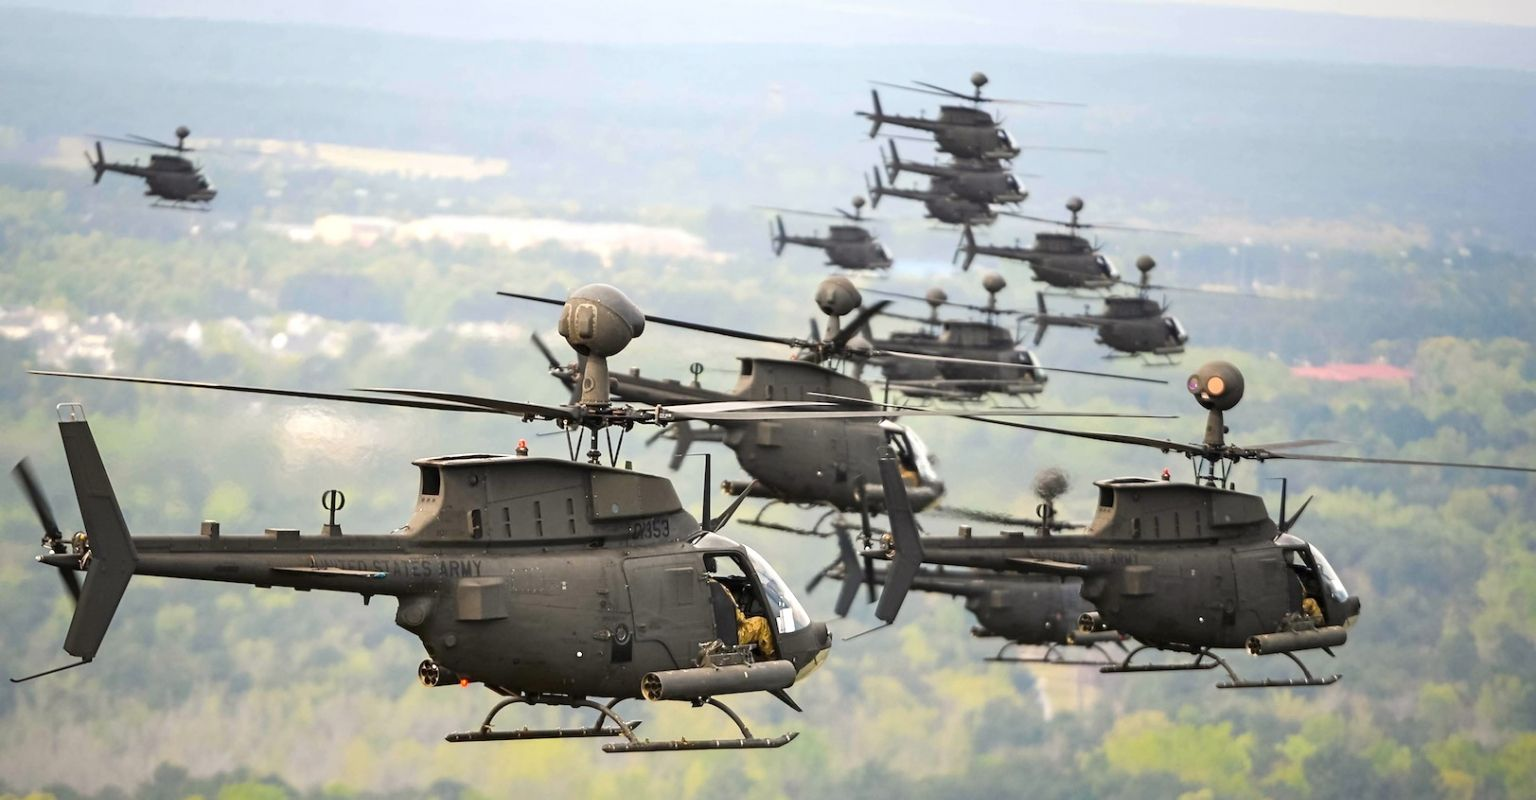 Patria u Velikoj Gorici želi centar za helikoptere